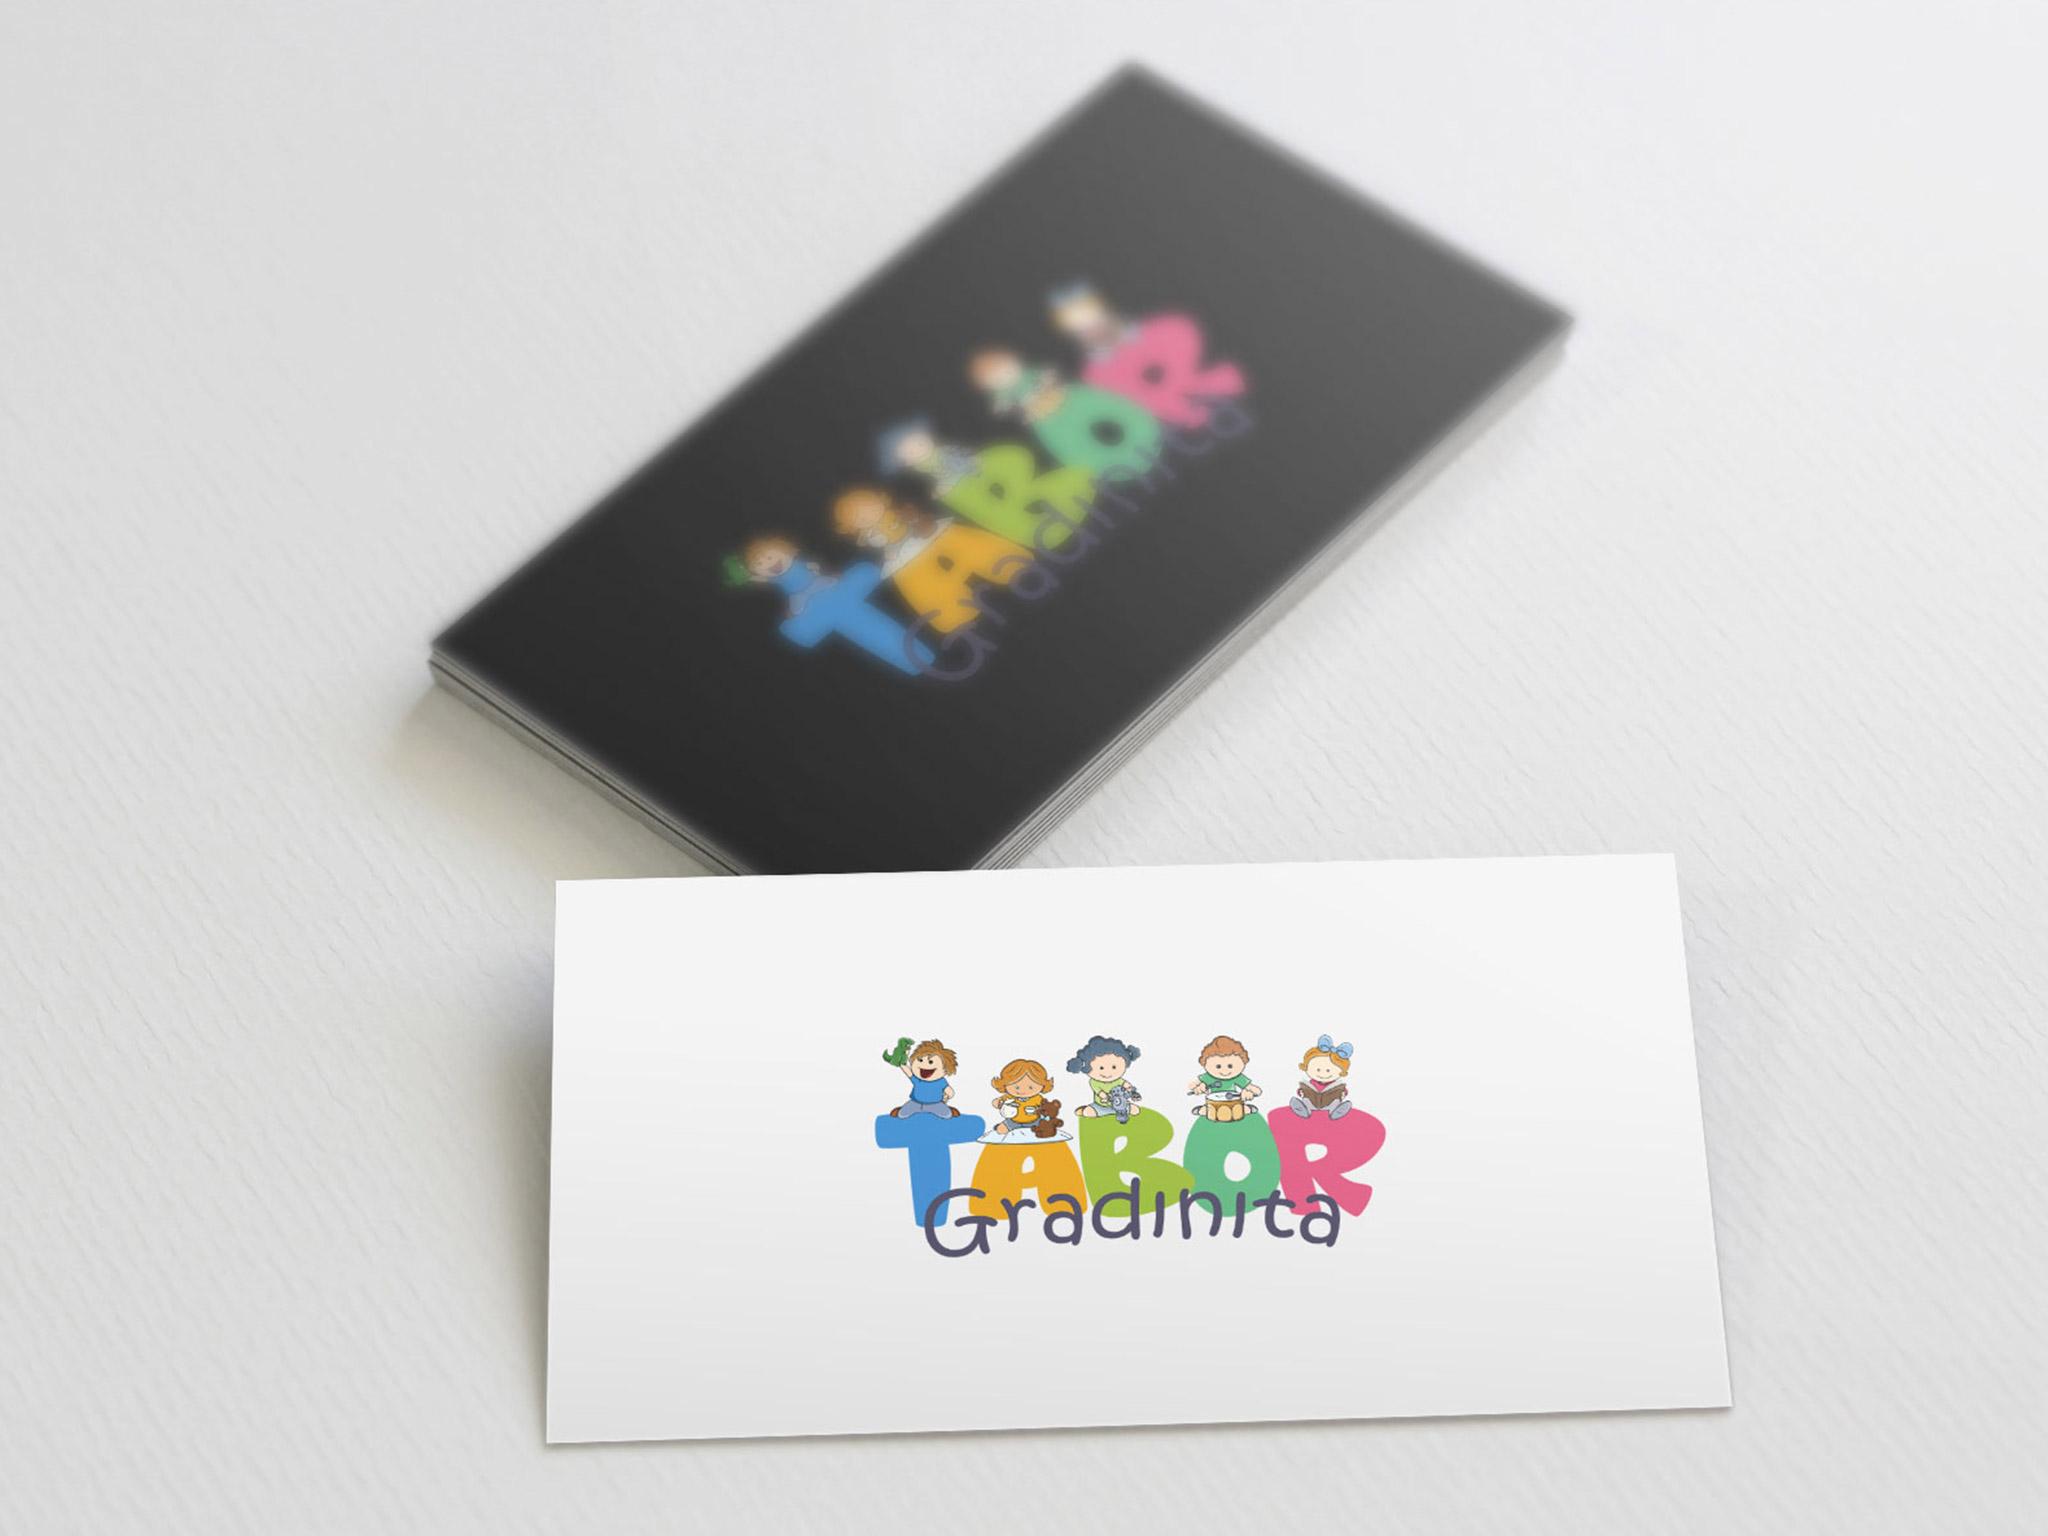 creare-logo-gradinita-tabor